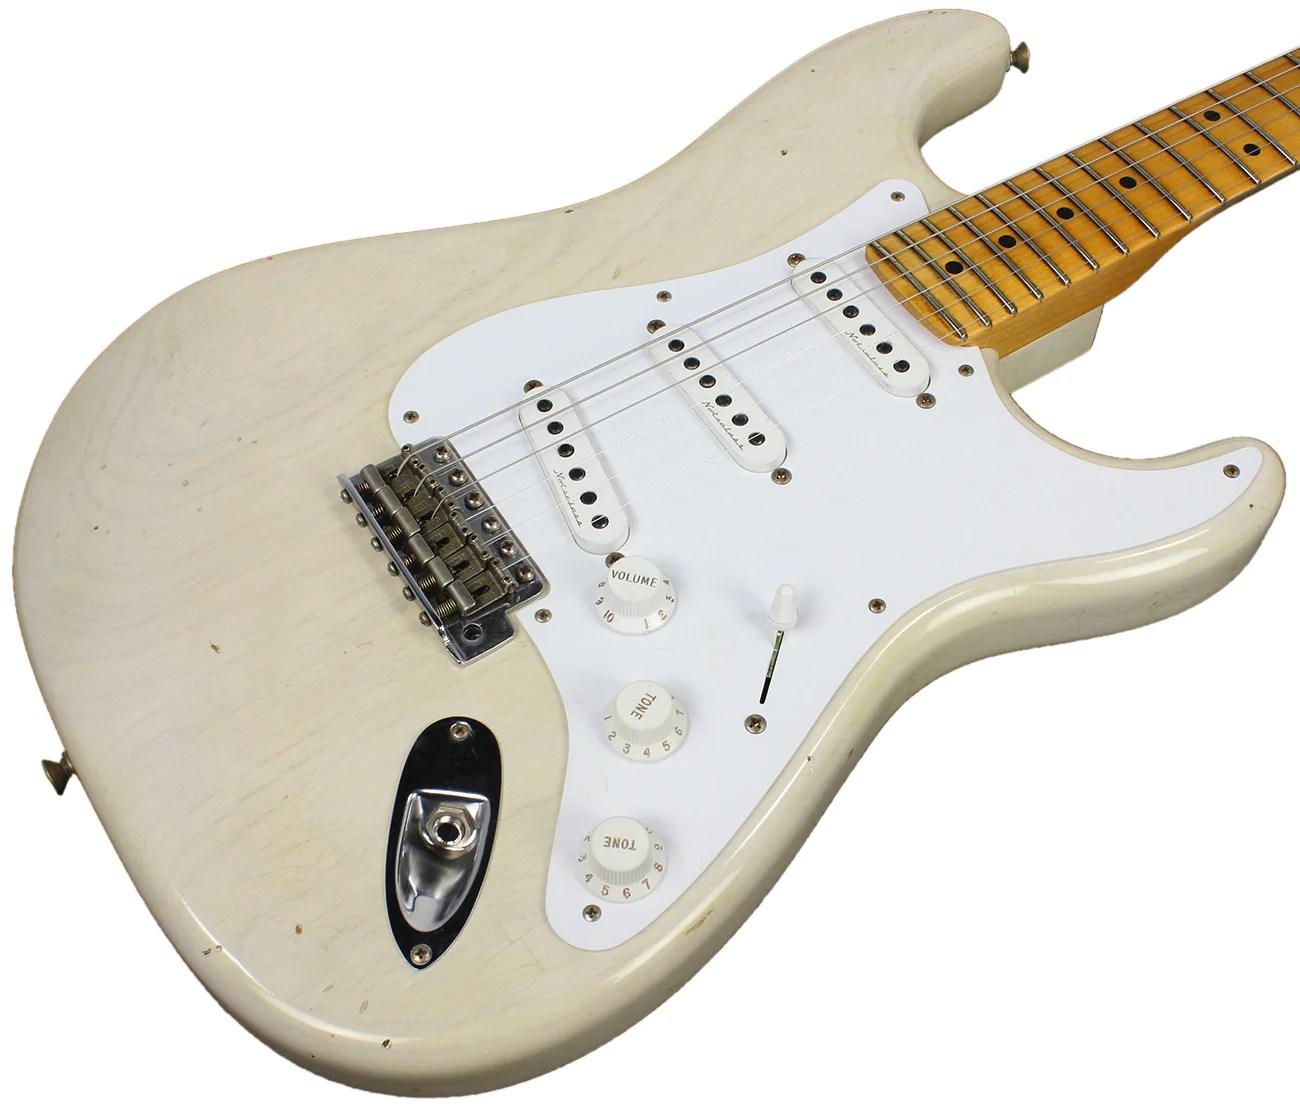 small resolution of fender custom shop eric clapton journeyman stratocaster relic guitar aged white blonde humbucker music